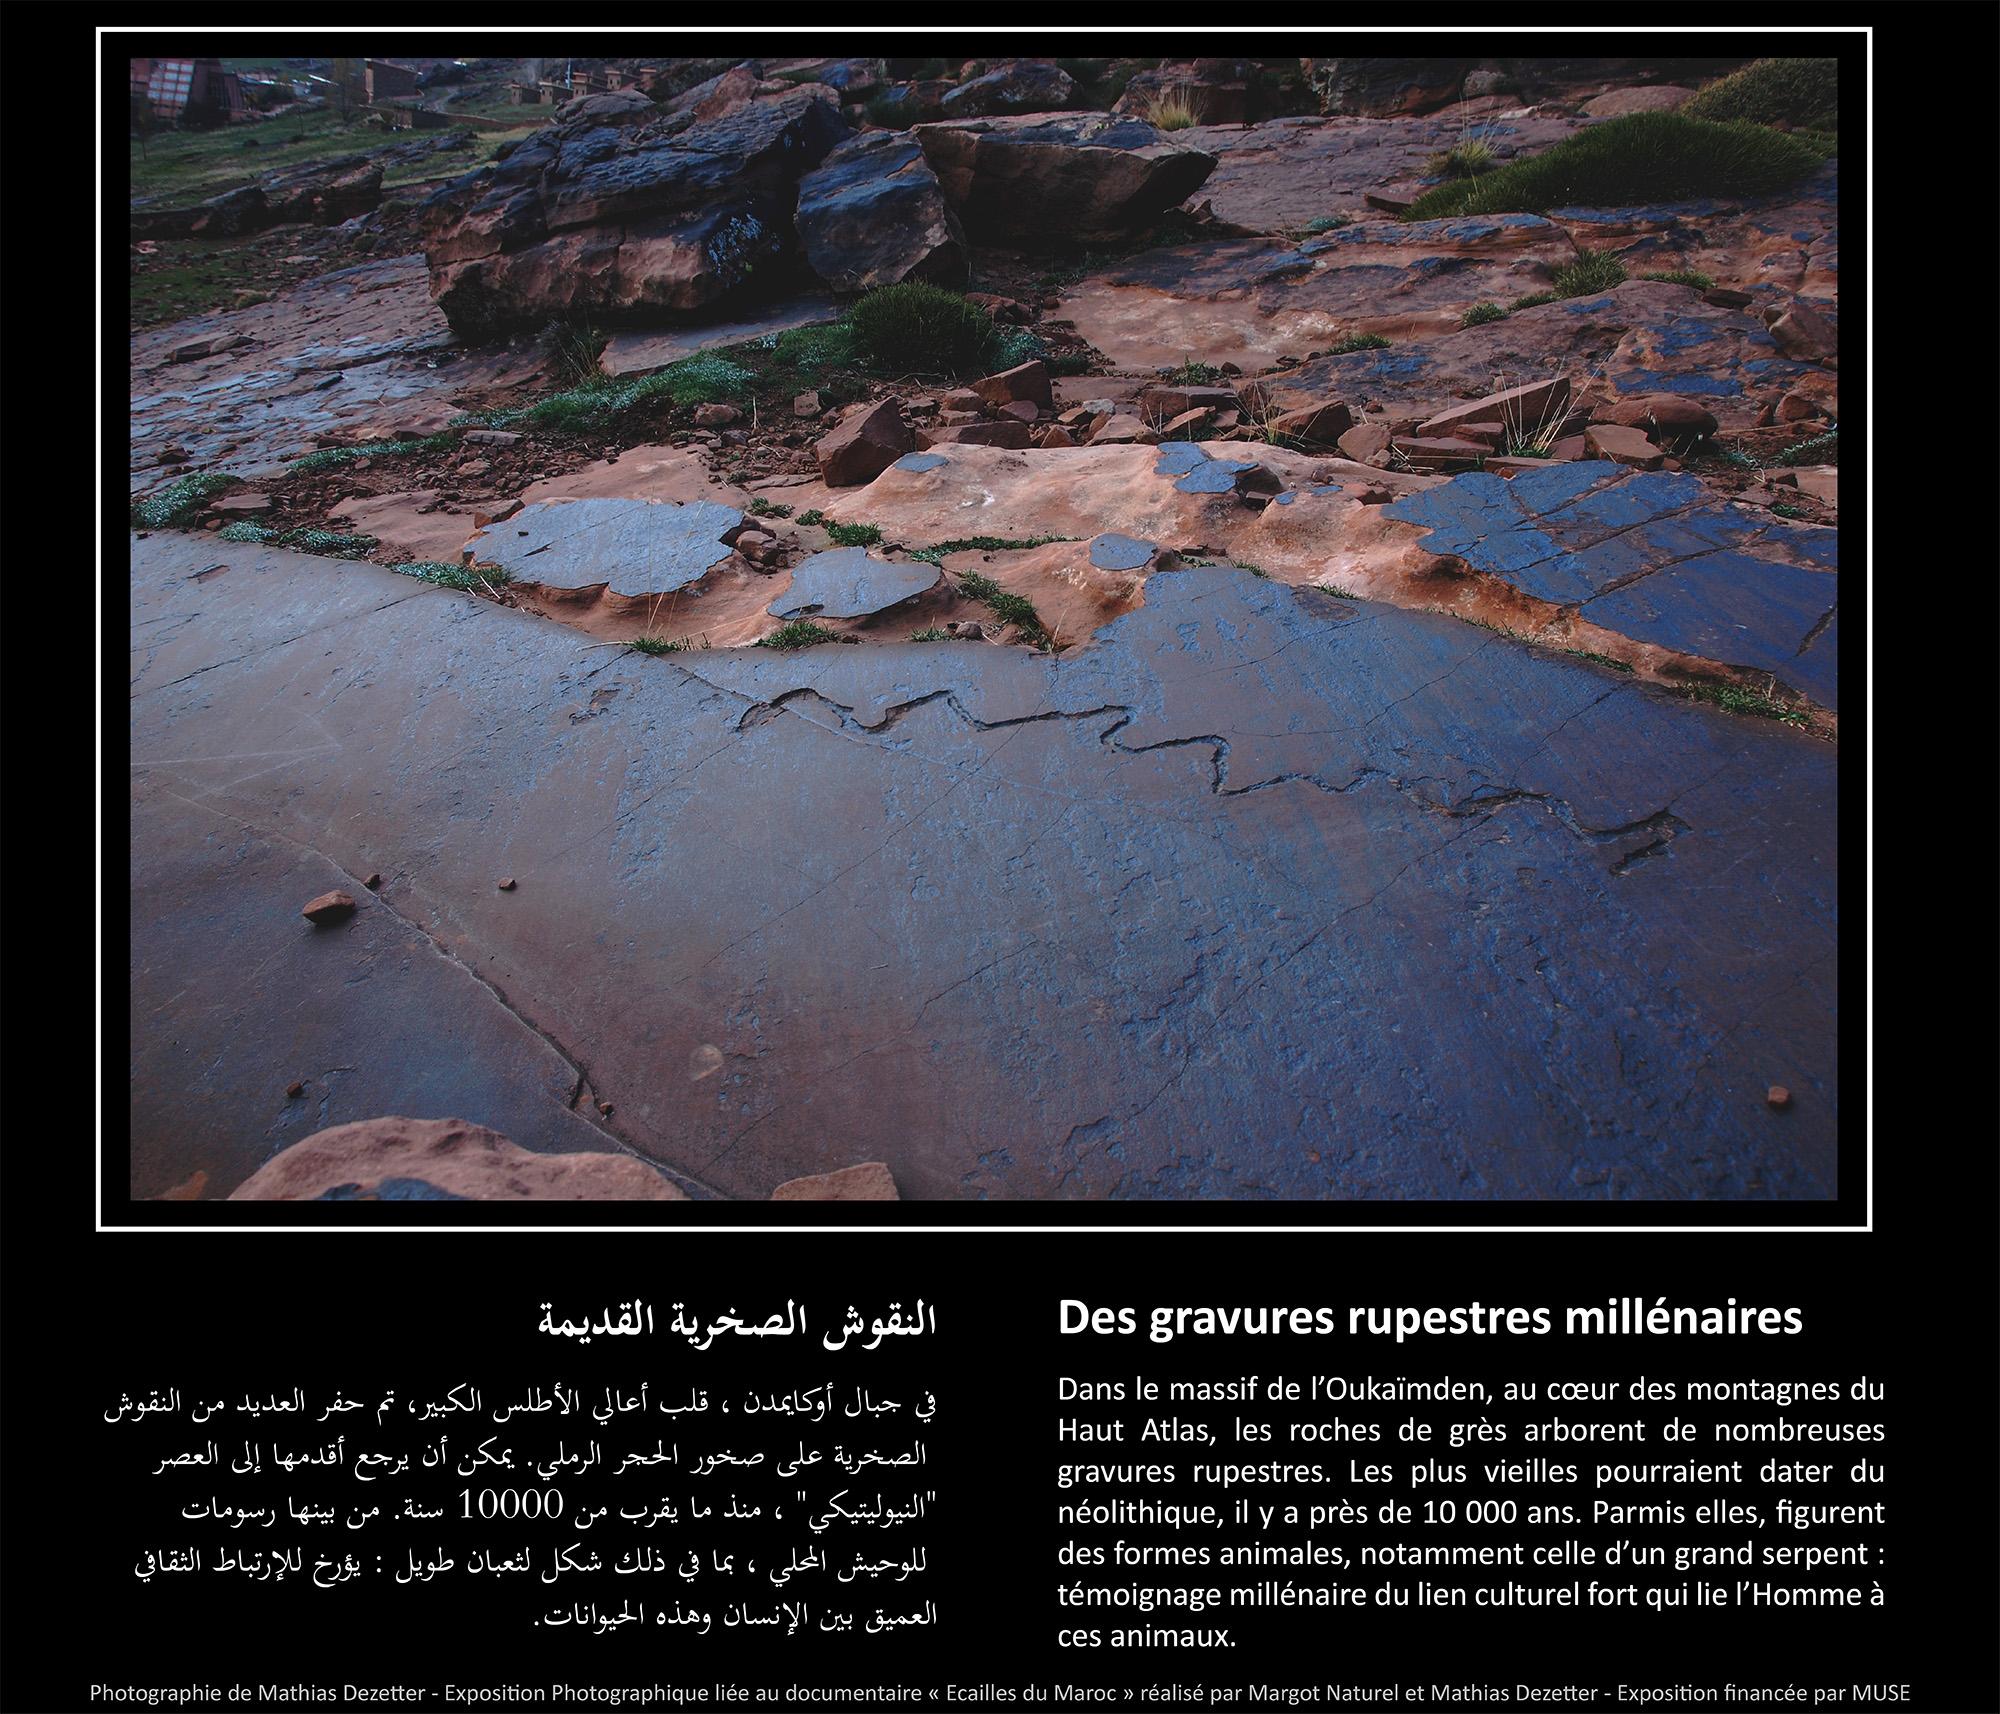 Des gravures rupestres millenaires copie